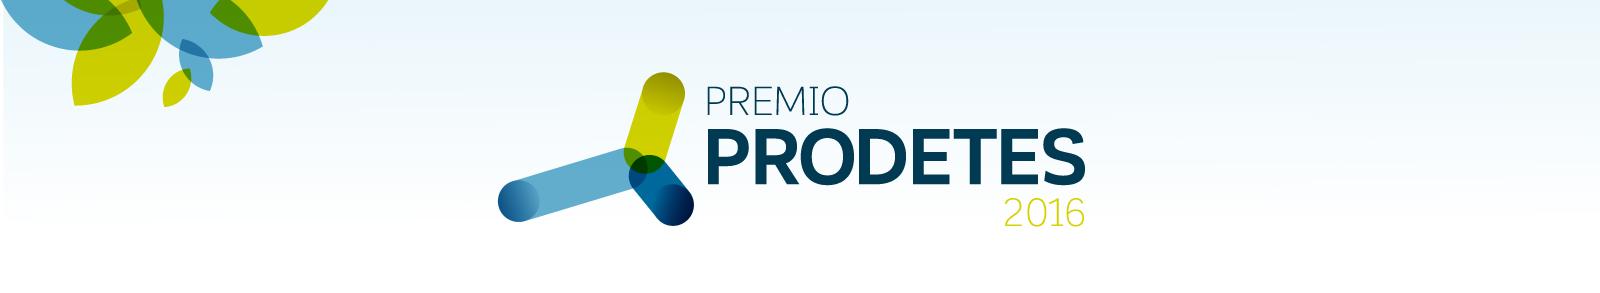 PREMIO PRODETES